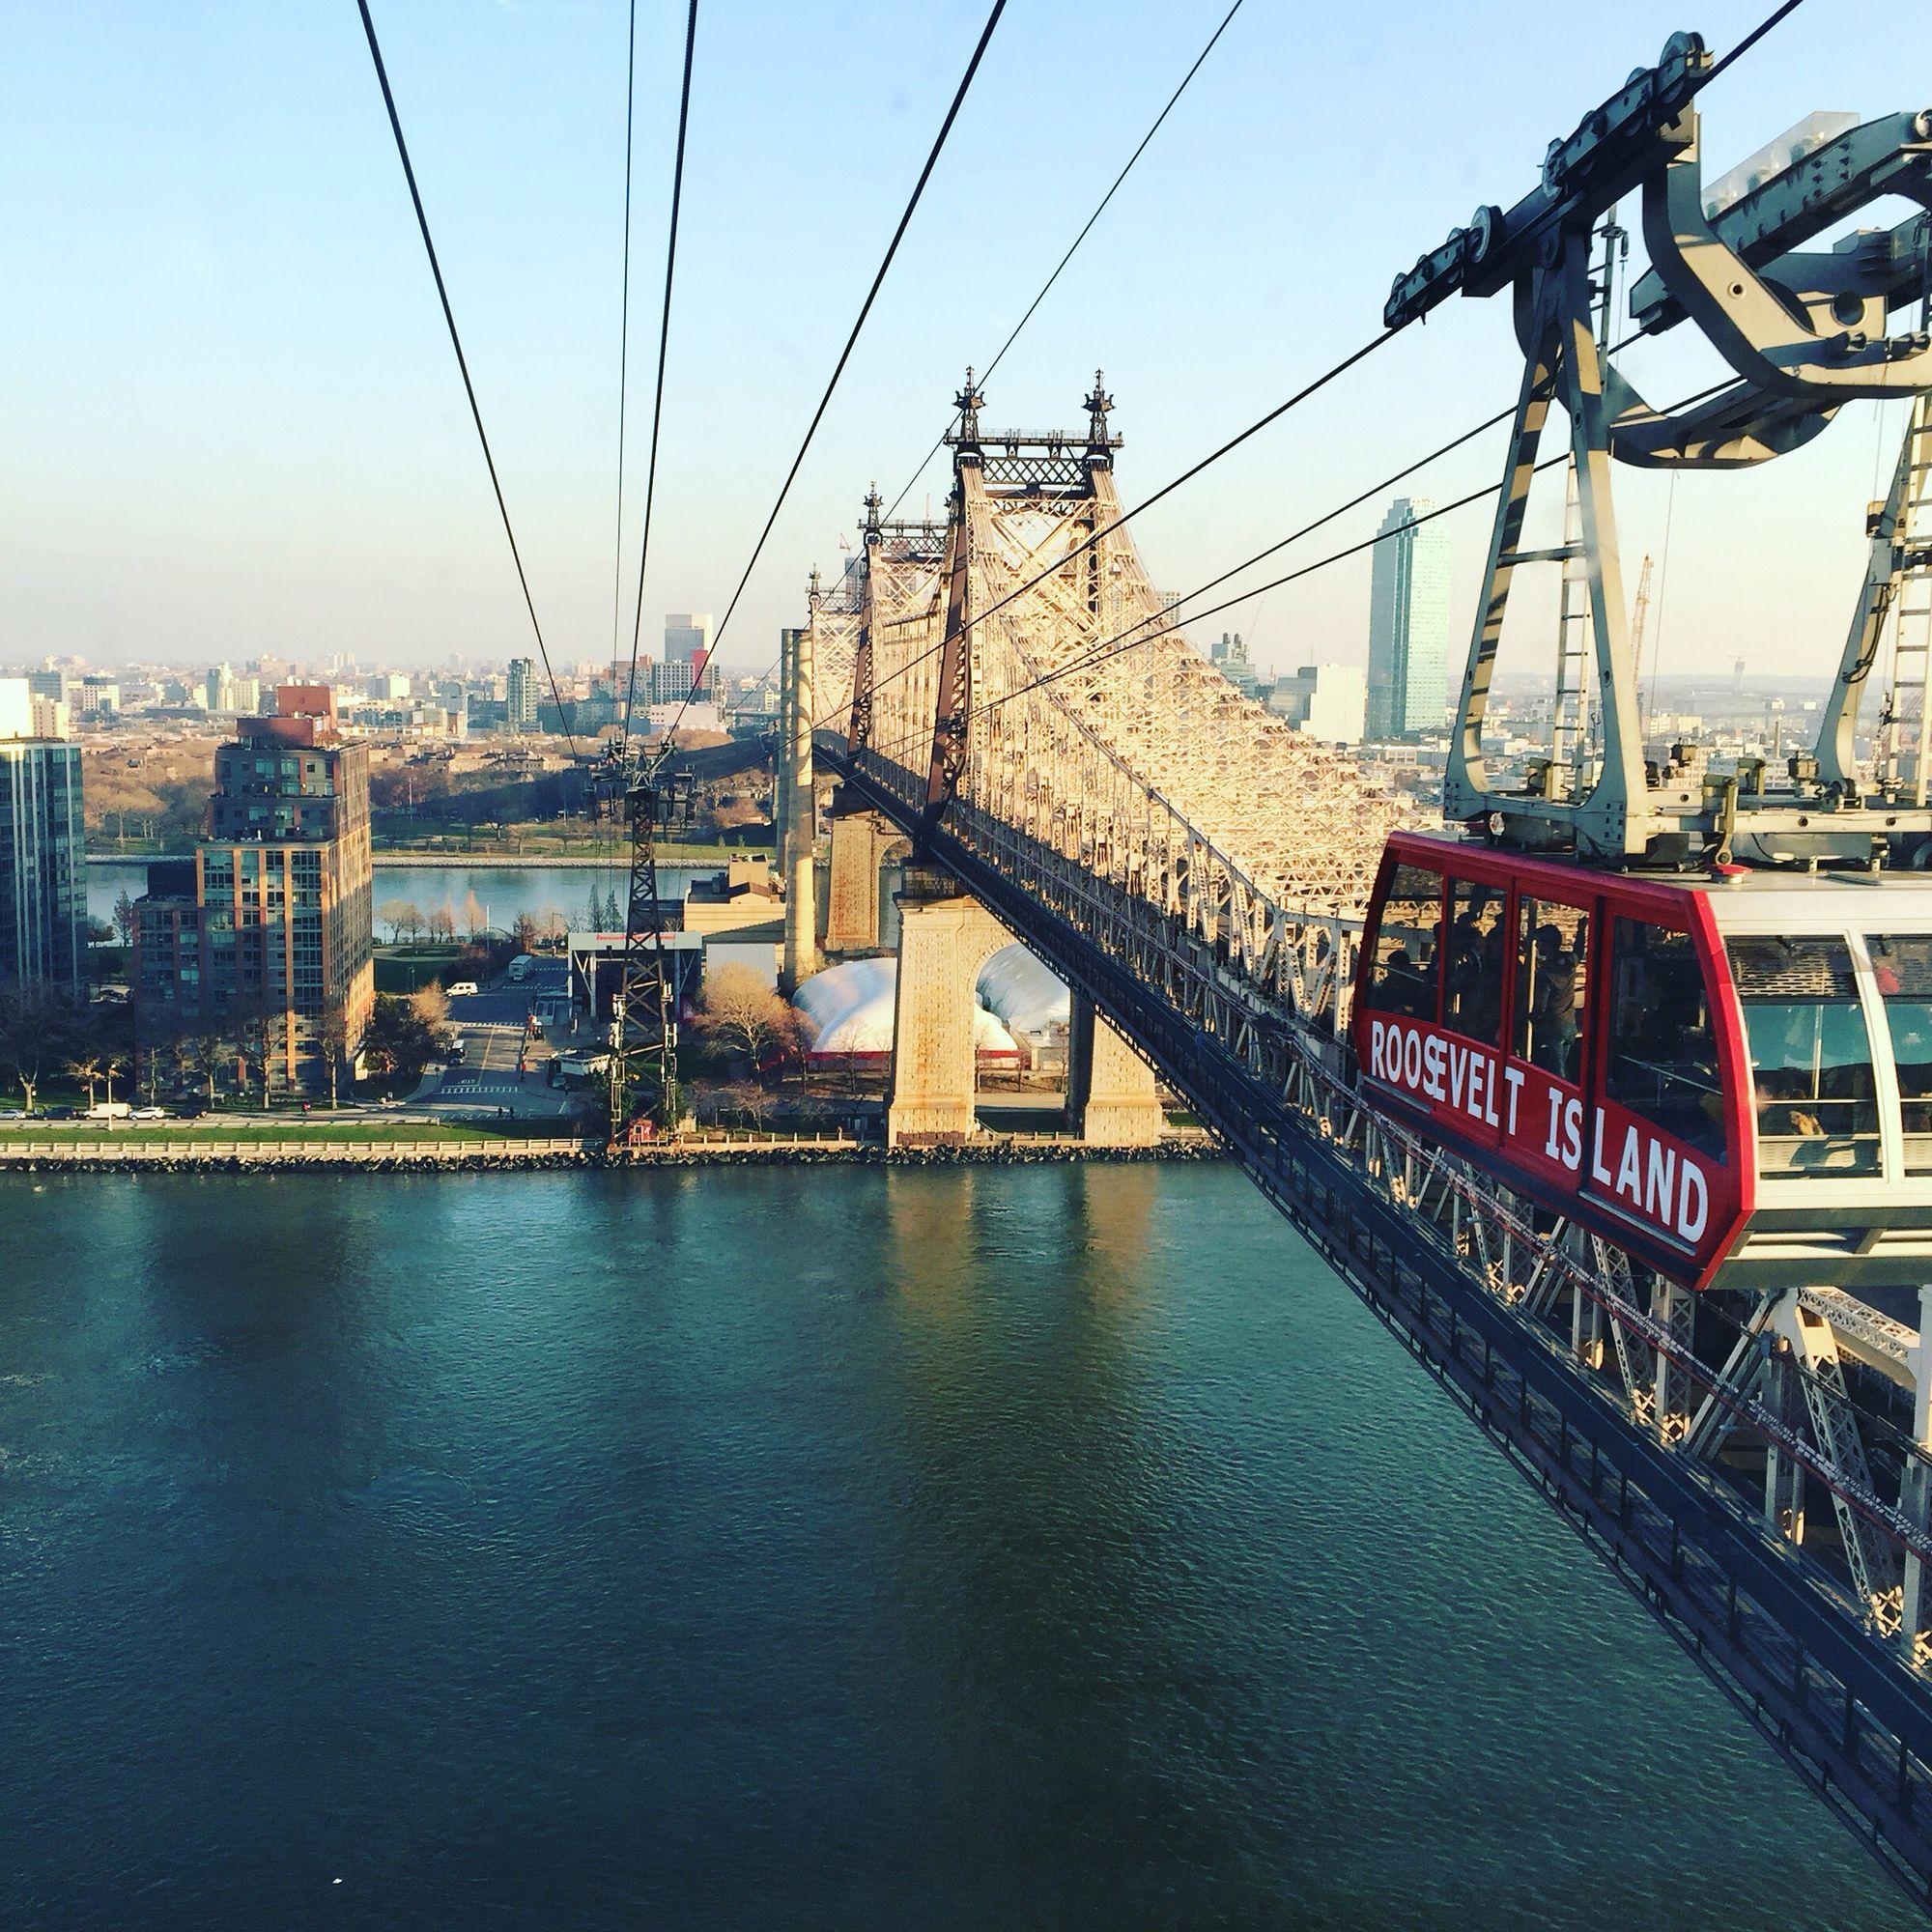 Roosevelt island tram and the Queens bridge. Ny,Ny